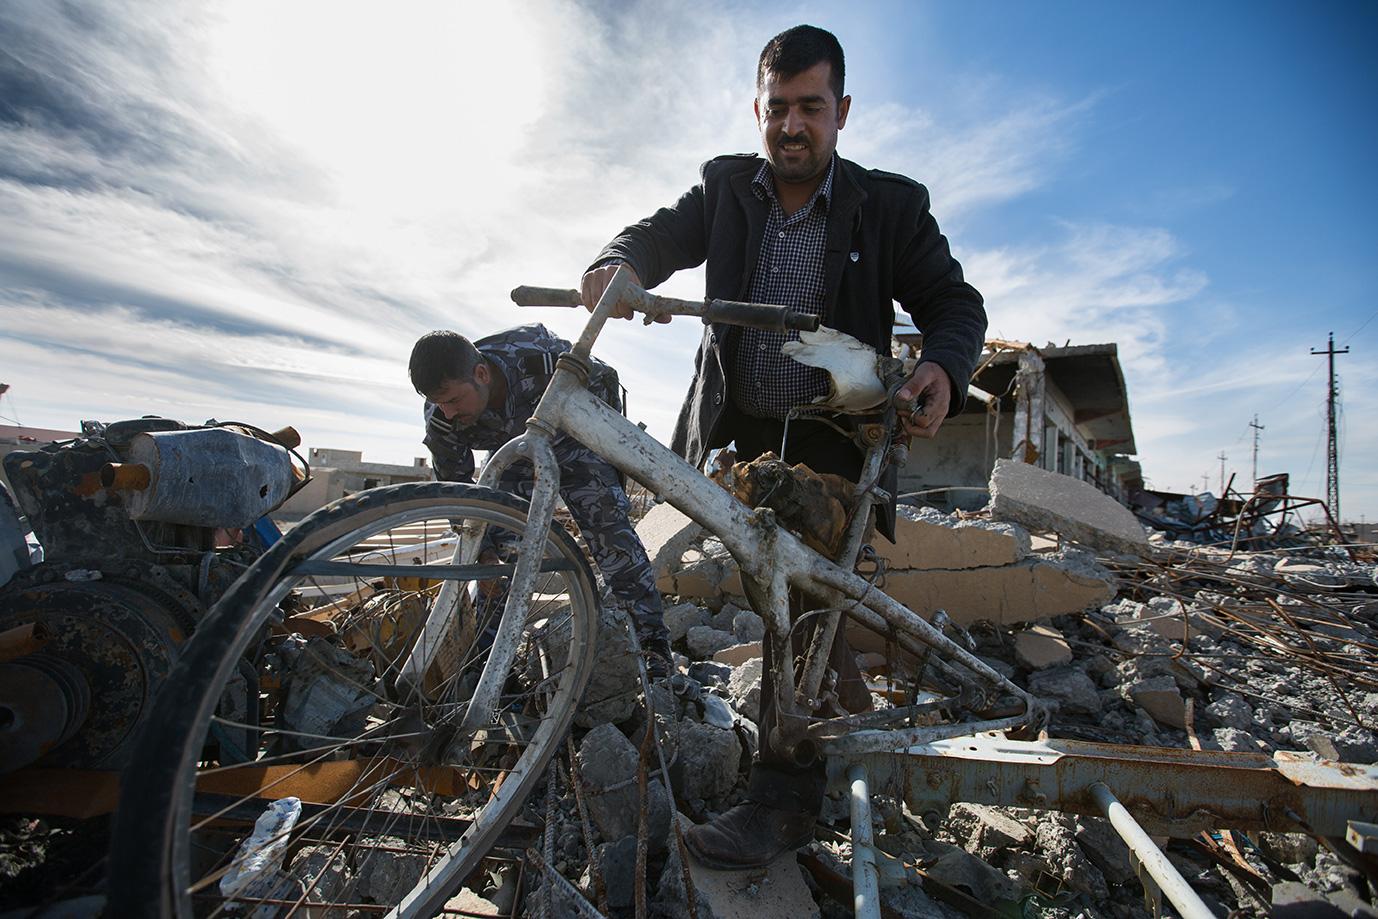 bicycle ruins sinjar iraq yesidi